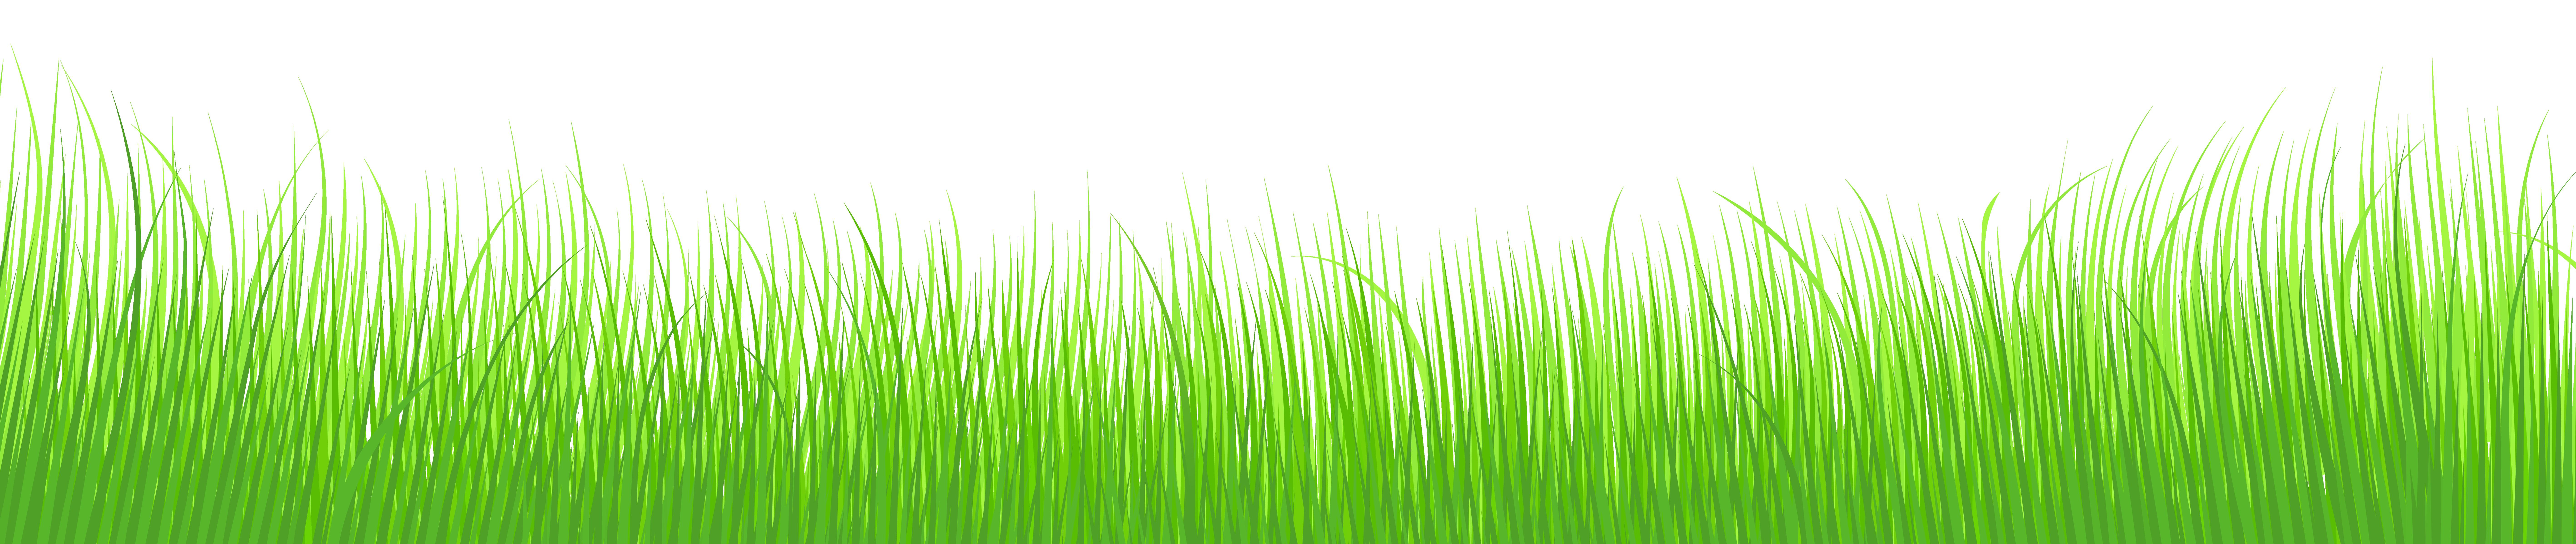 Free clip art grass clipart image